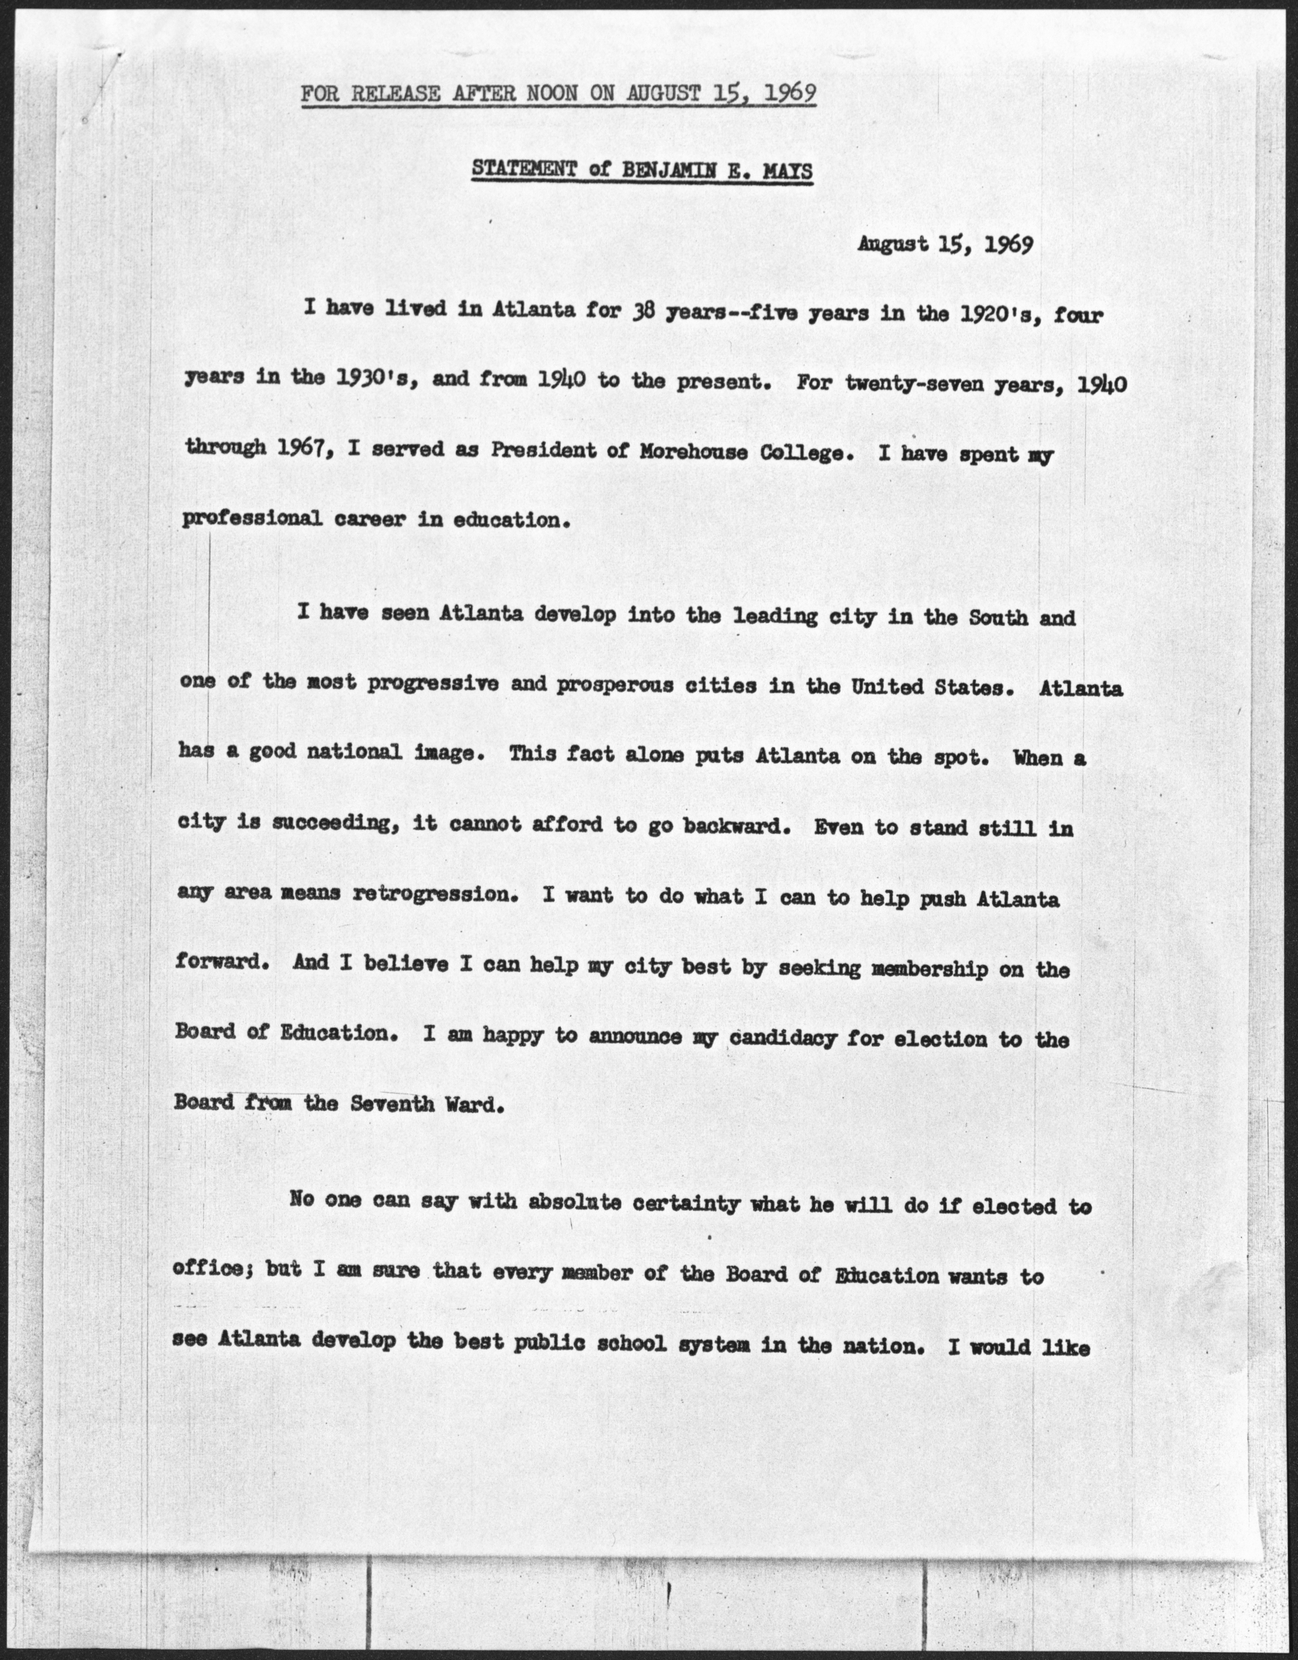 Statement of Benjamin E. Mays